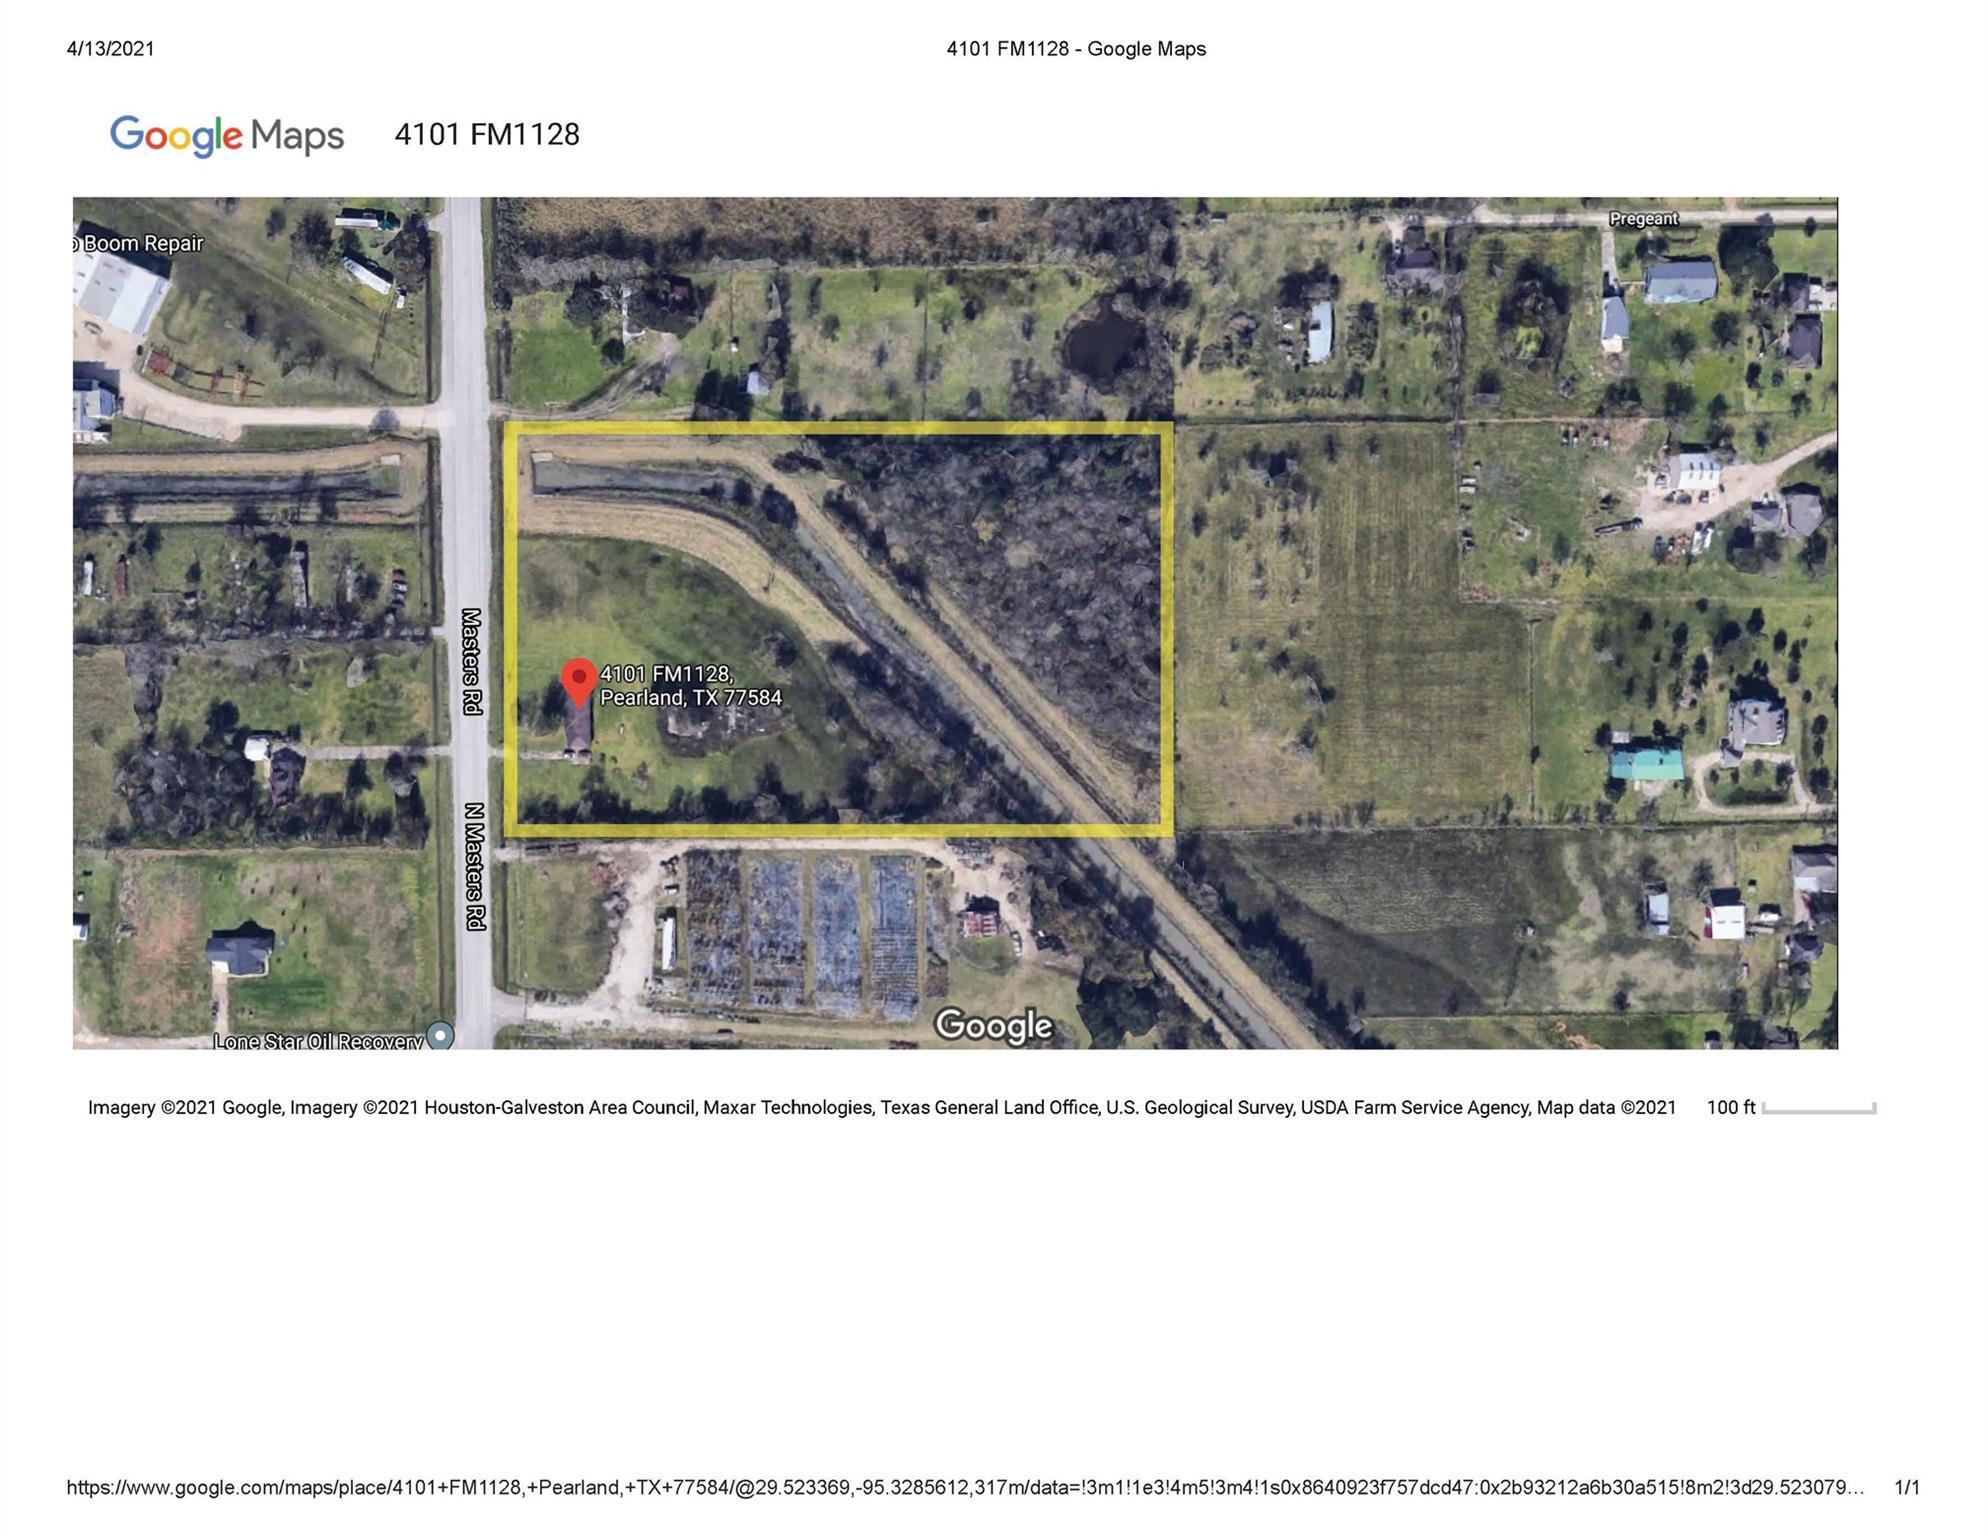 4101 Fm 1128 Road Property Photo